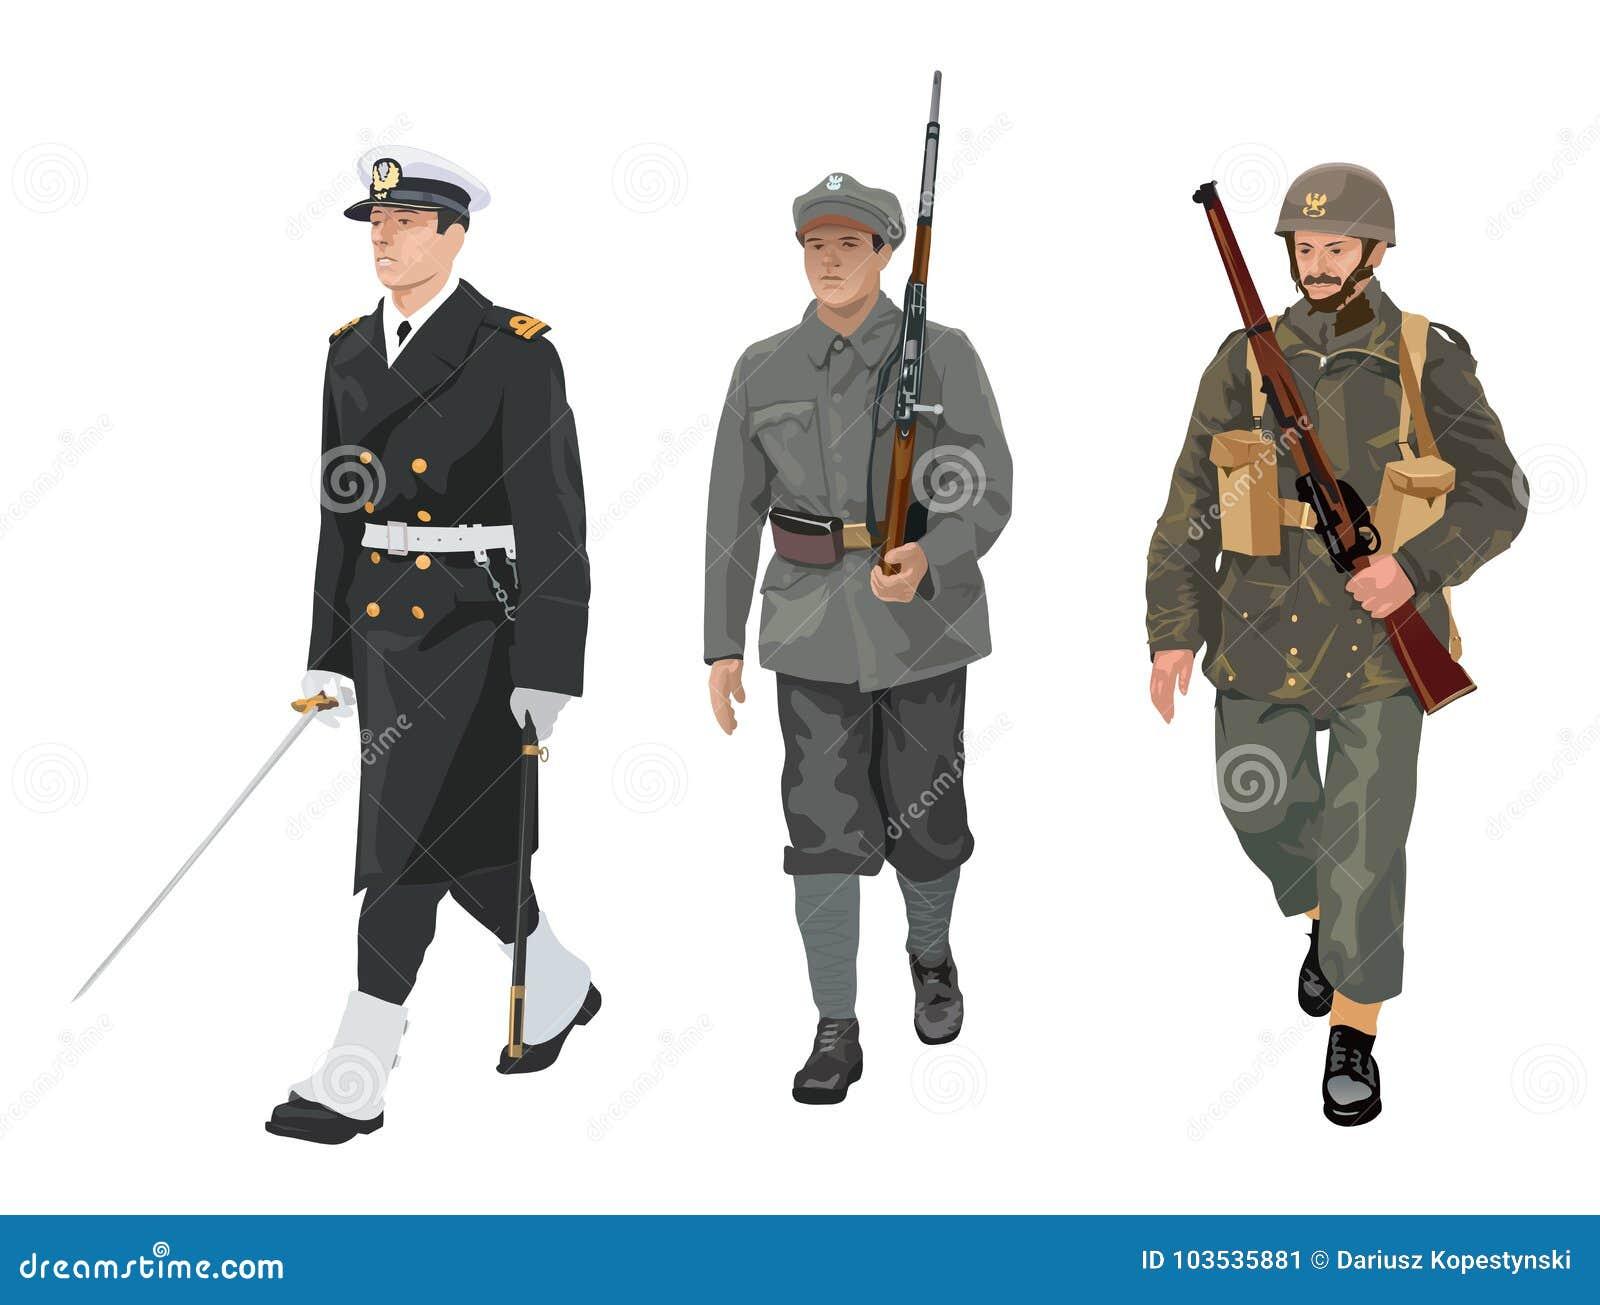 a67e1775016 Πολωνικές στολές στρατού διανυσματική απεικόνιση. εικονογραφία από ...